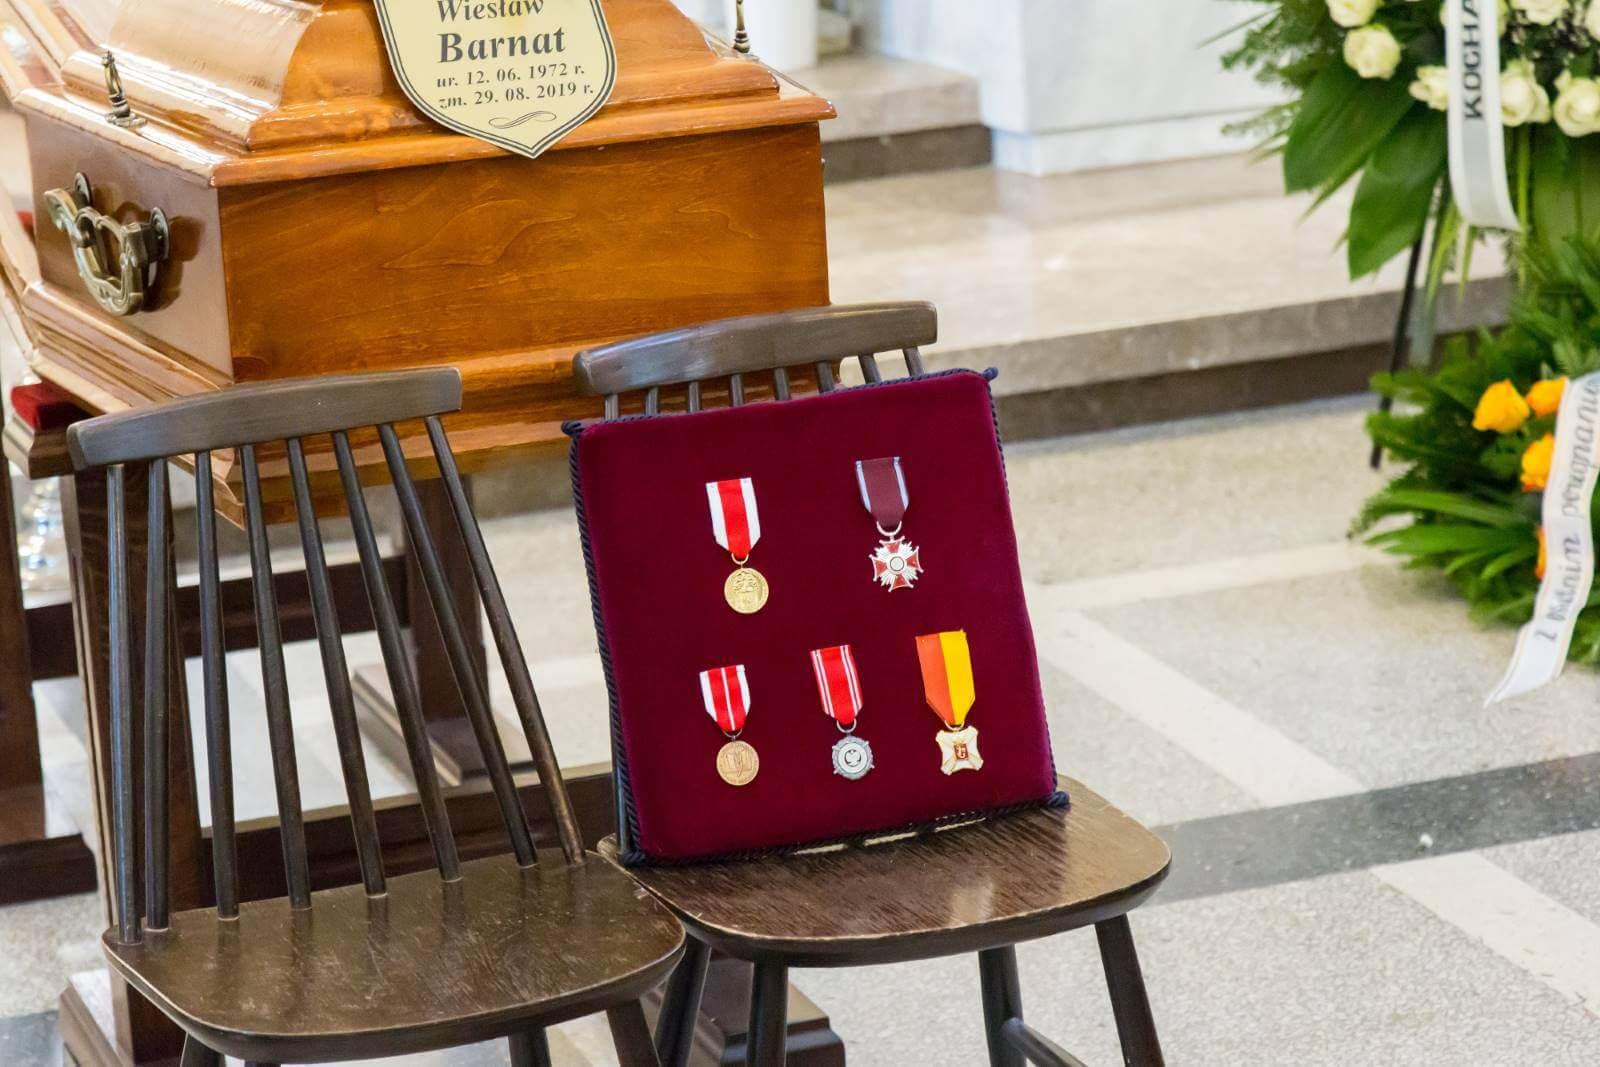 medale wojskowego